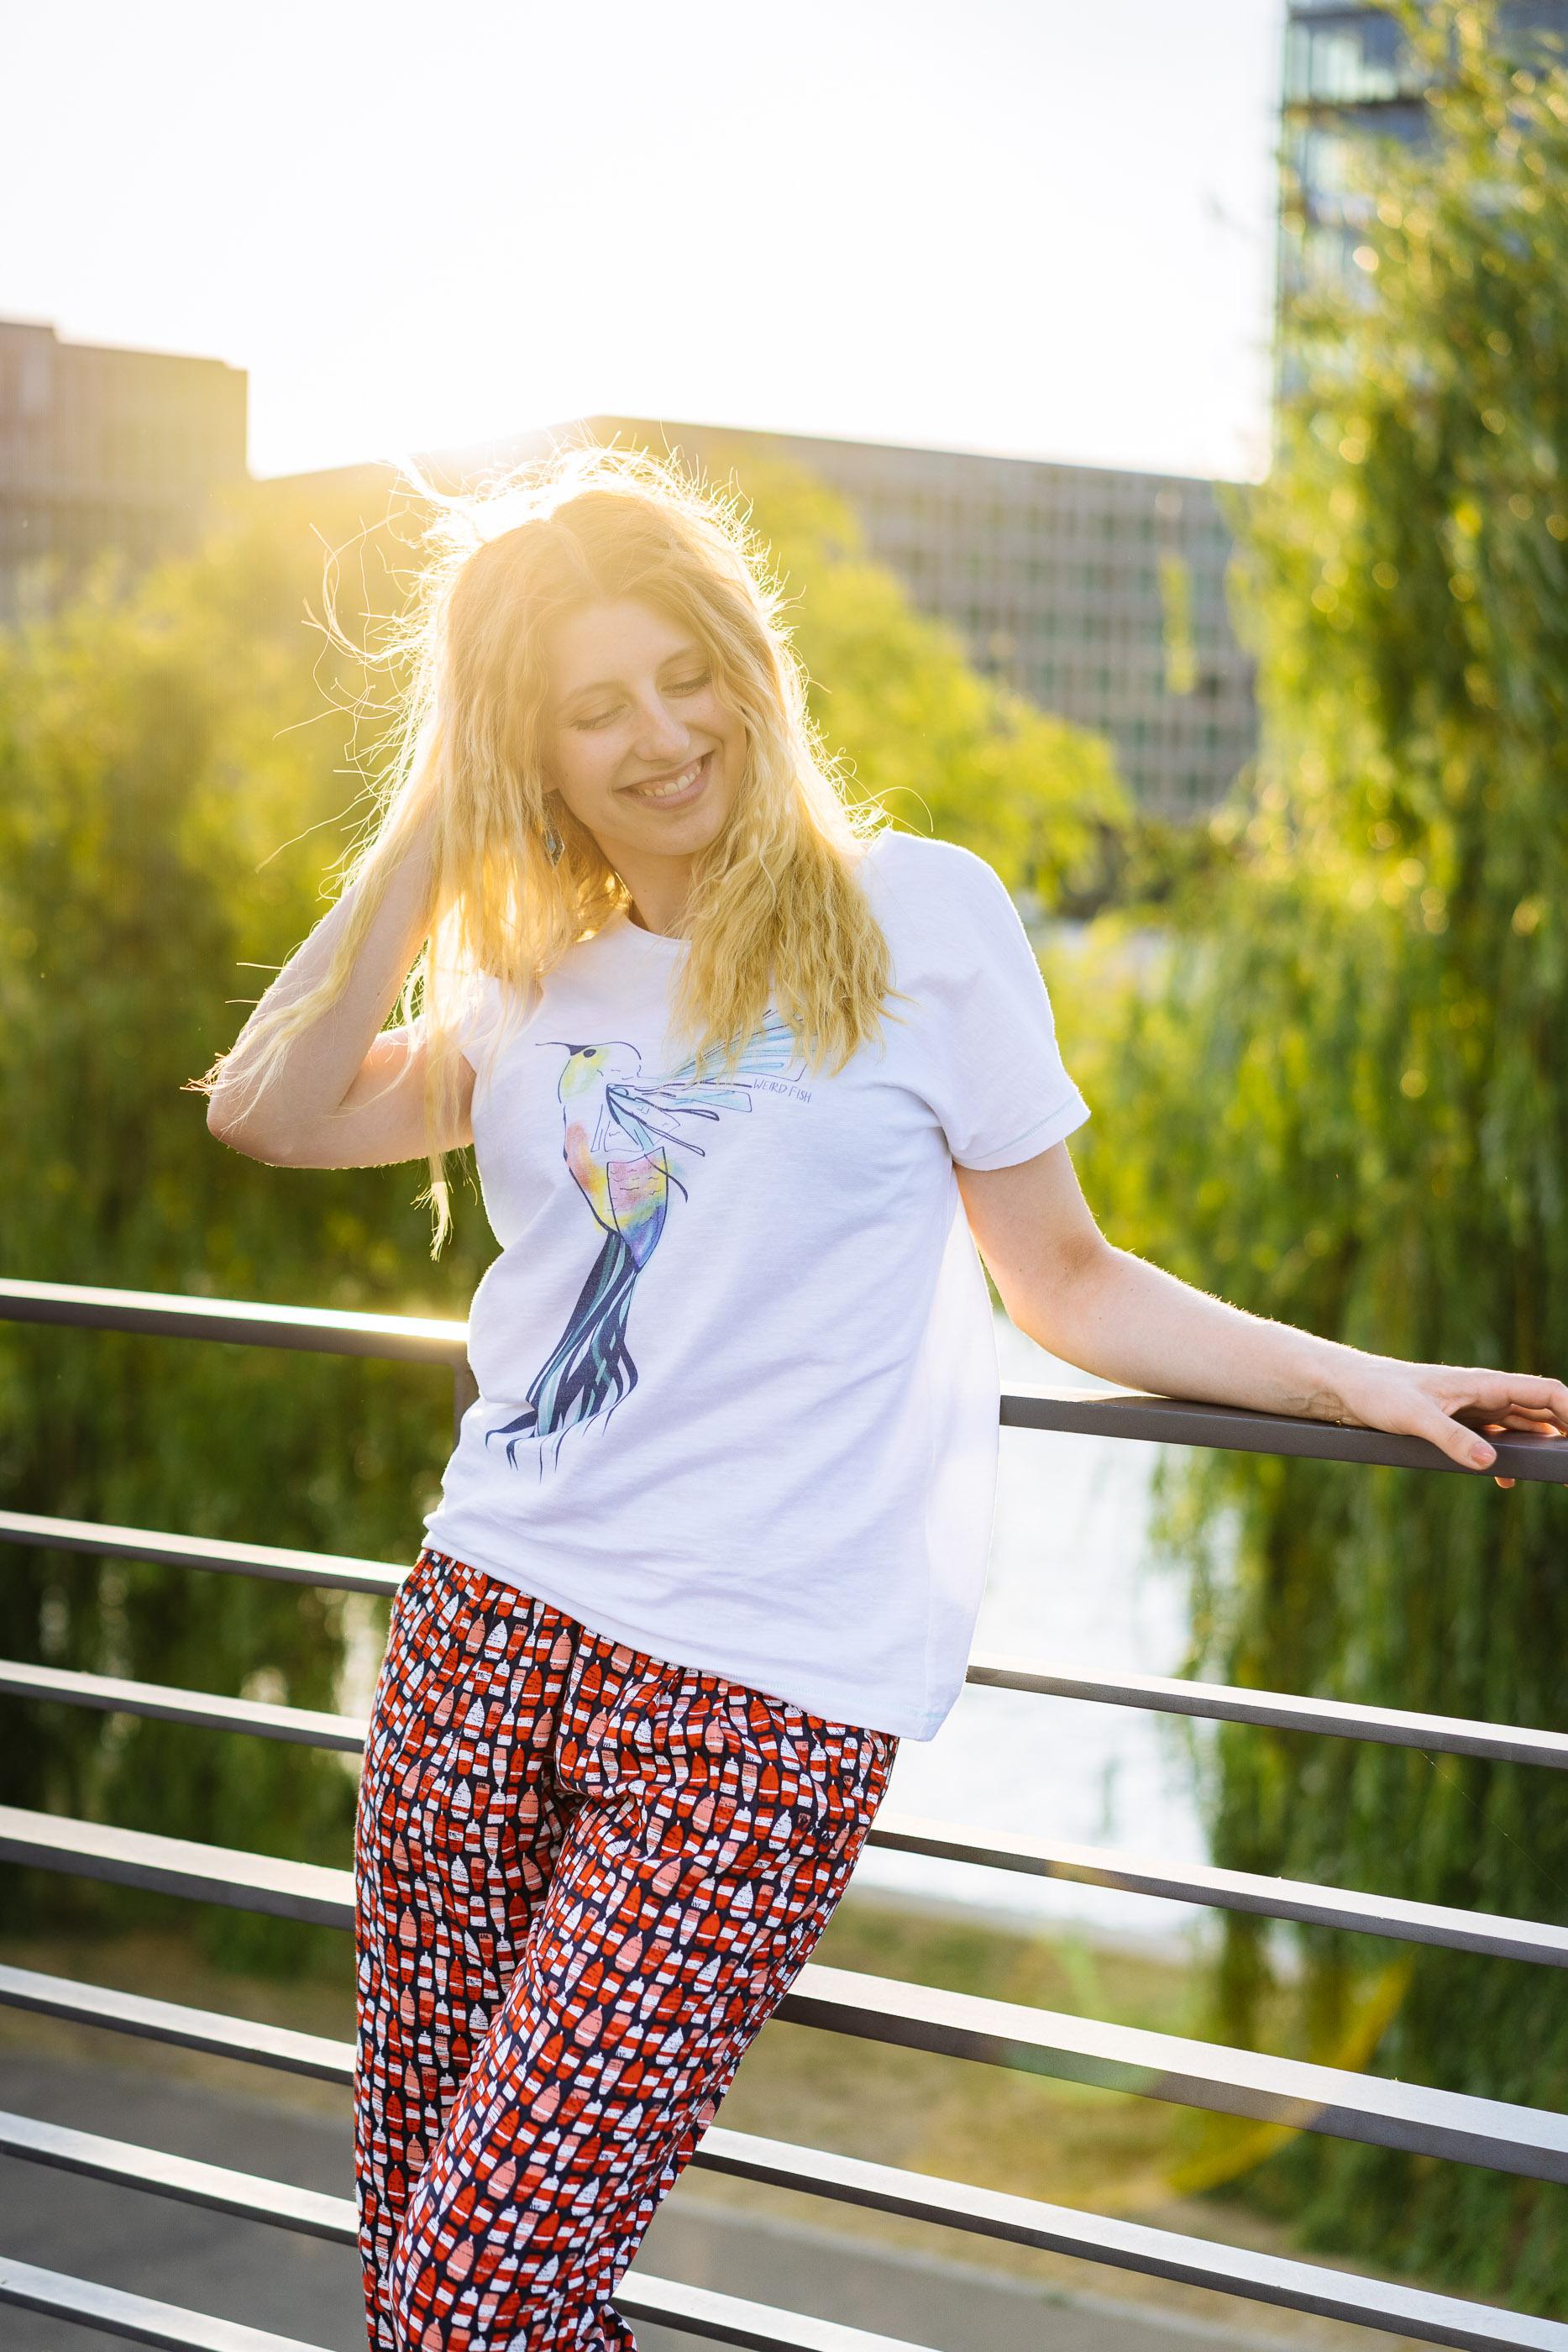 Weird Fish Clothing - PANORAMA Berlin 2019